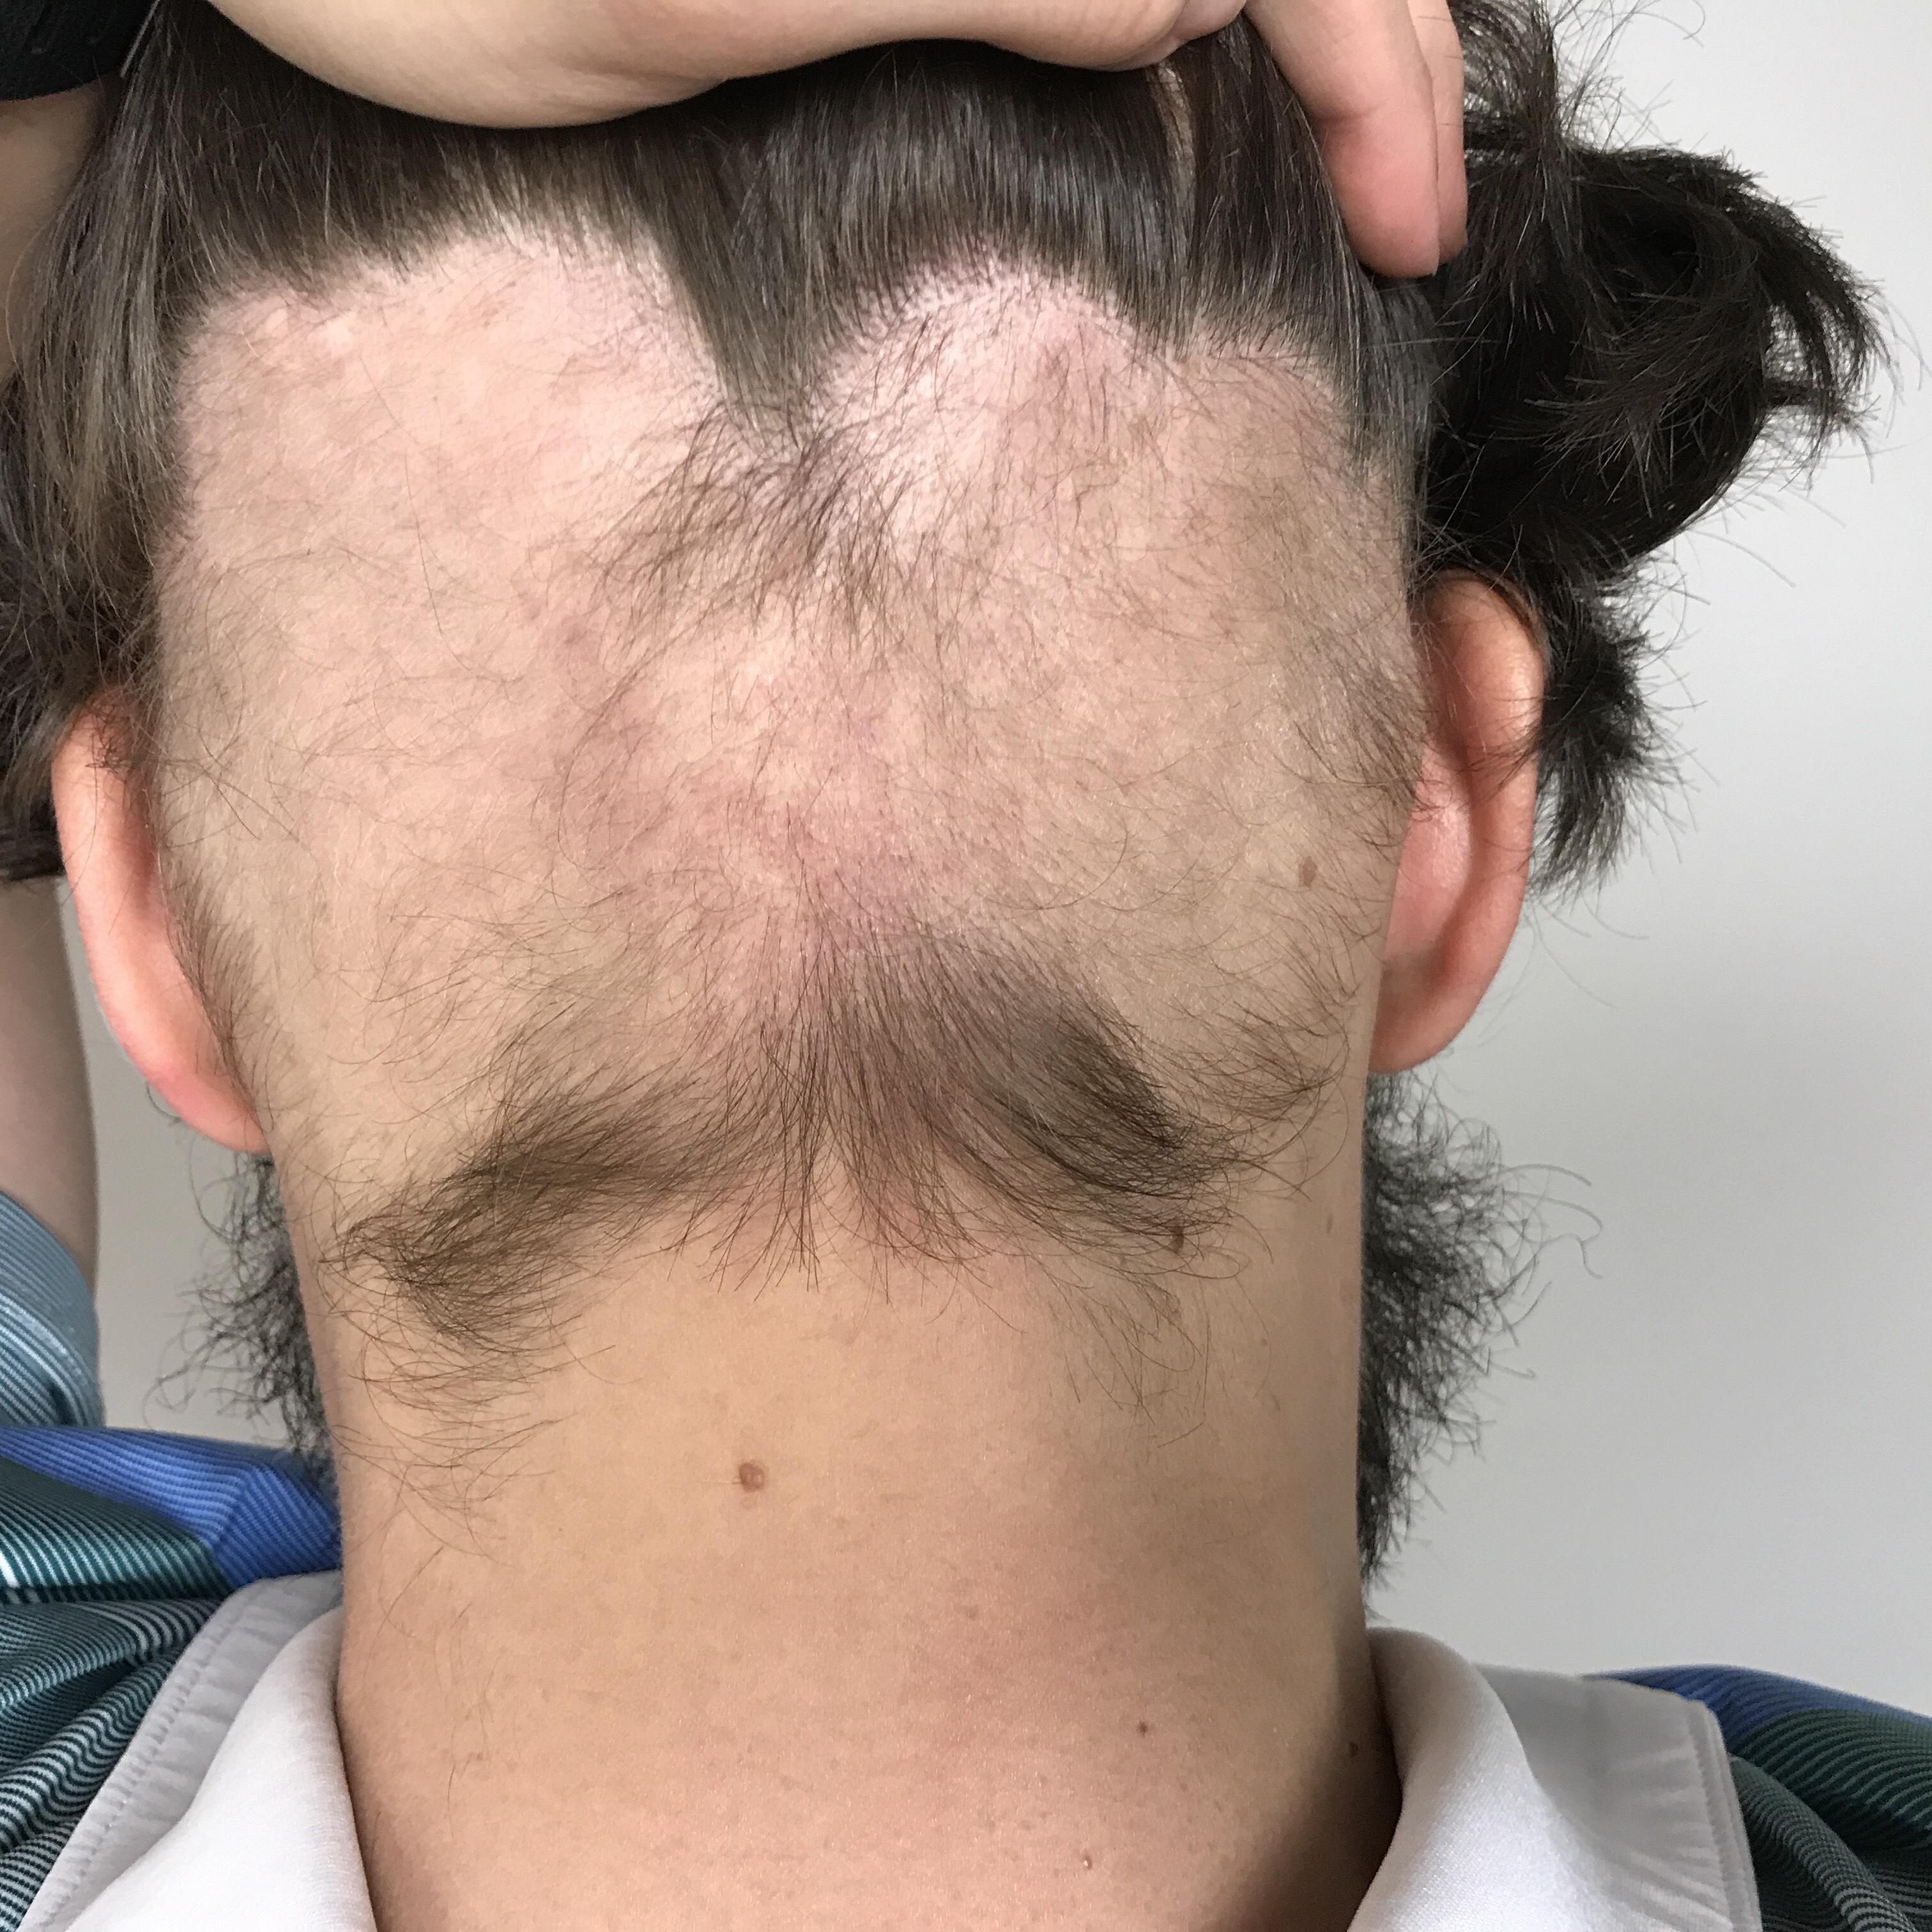 Alopecia 01 - David Fedor back